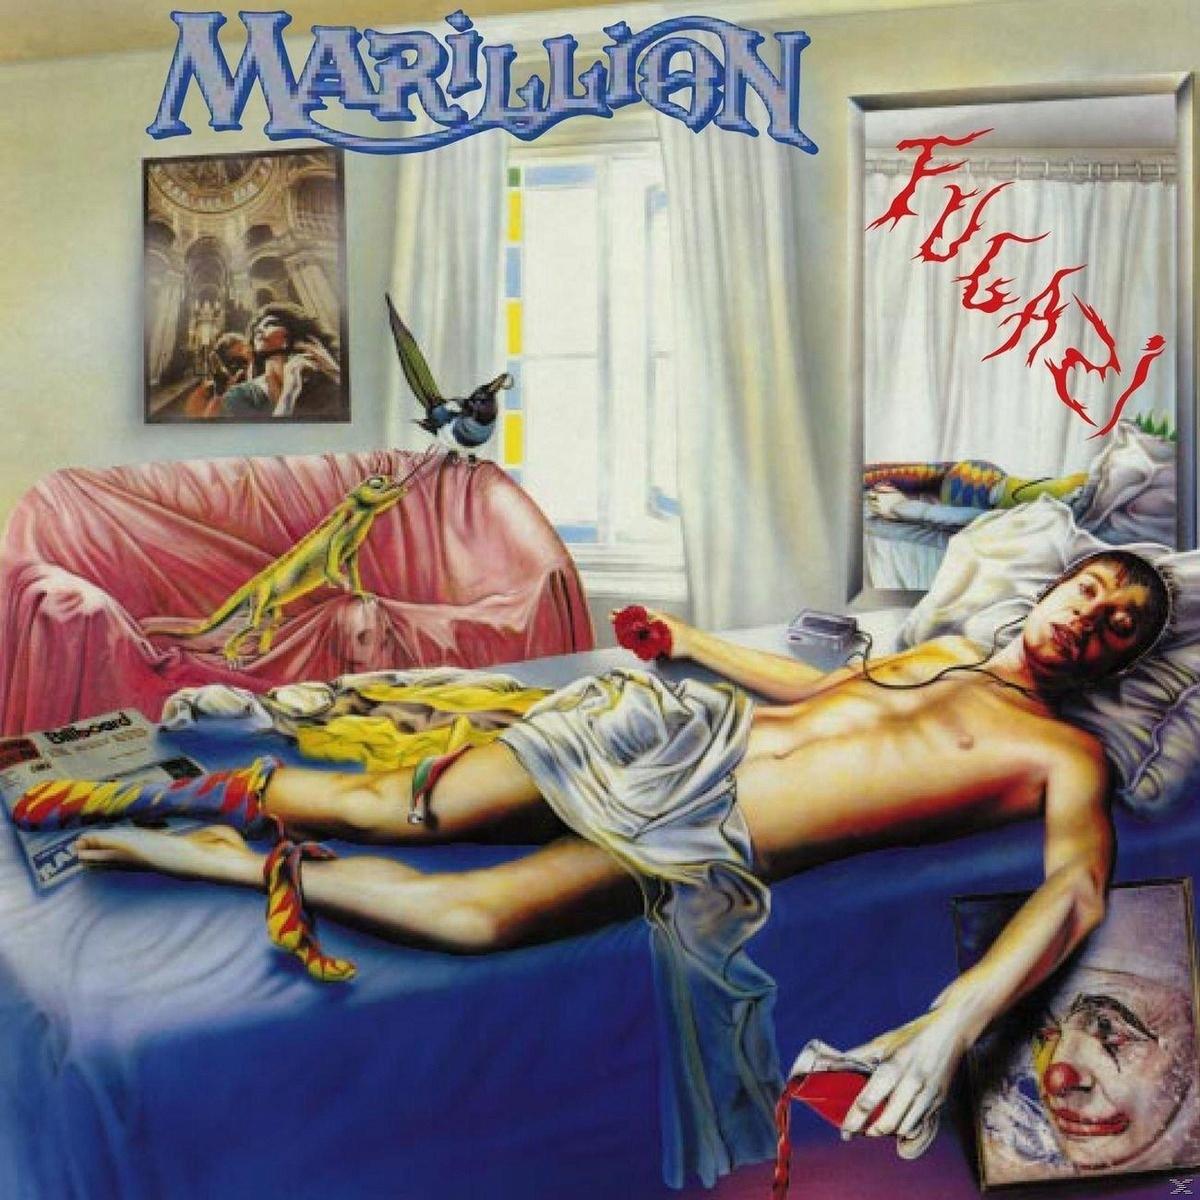 Fugazi Marillion (180g Vinyl), oferta MediaMarkt, dostawa ze Smart 0 zł